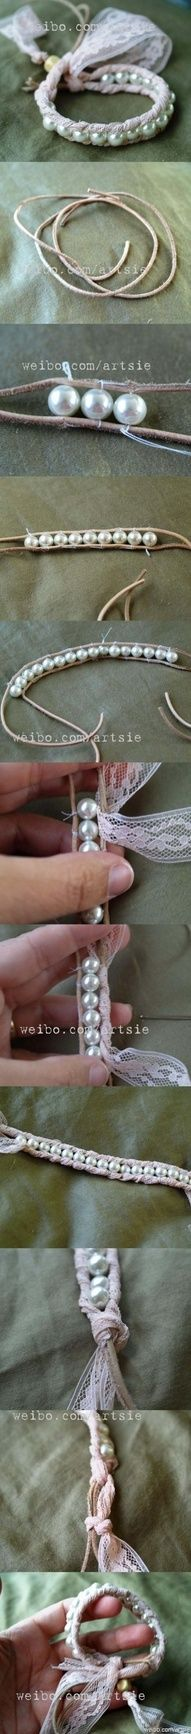 DIY lace & pearl bracelet